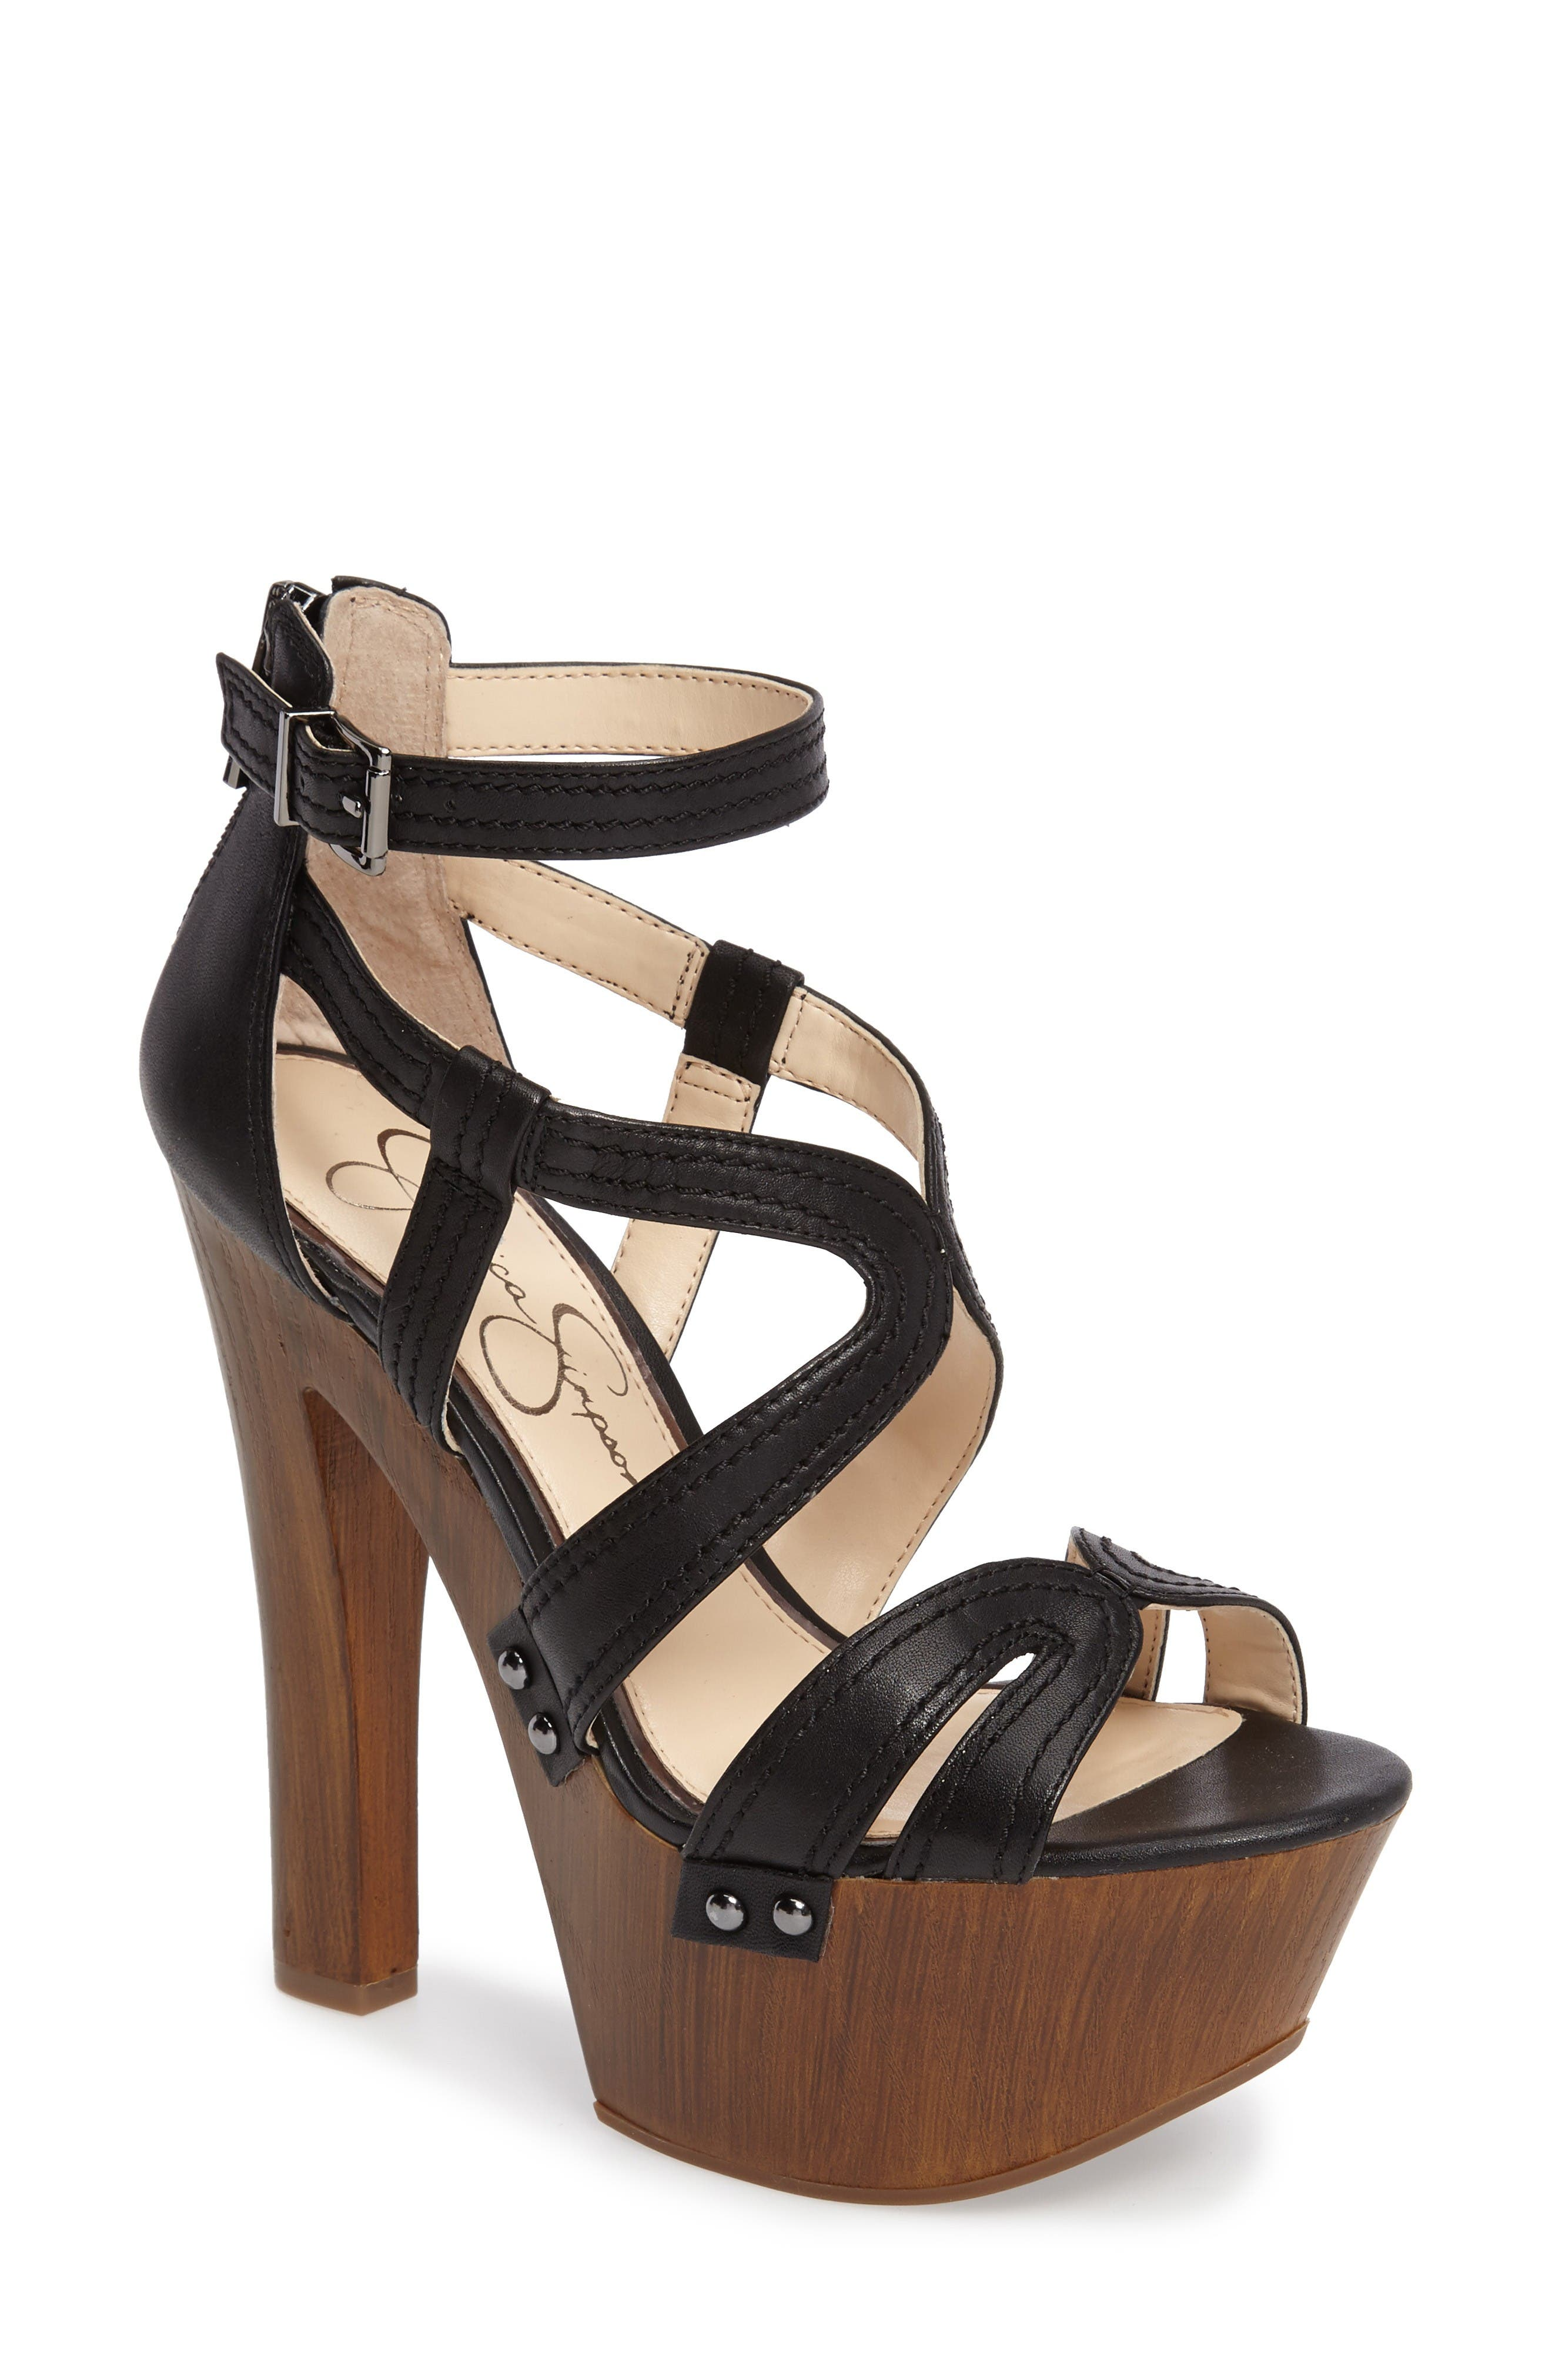 Alternate Image 1 Selected - Jessica Simpson Dorrin Platform Sandal (Women)